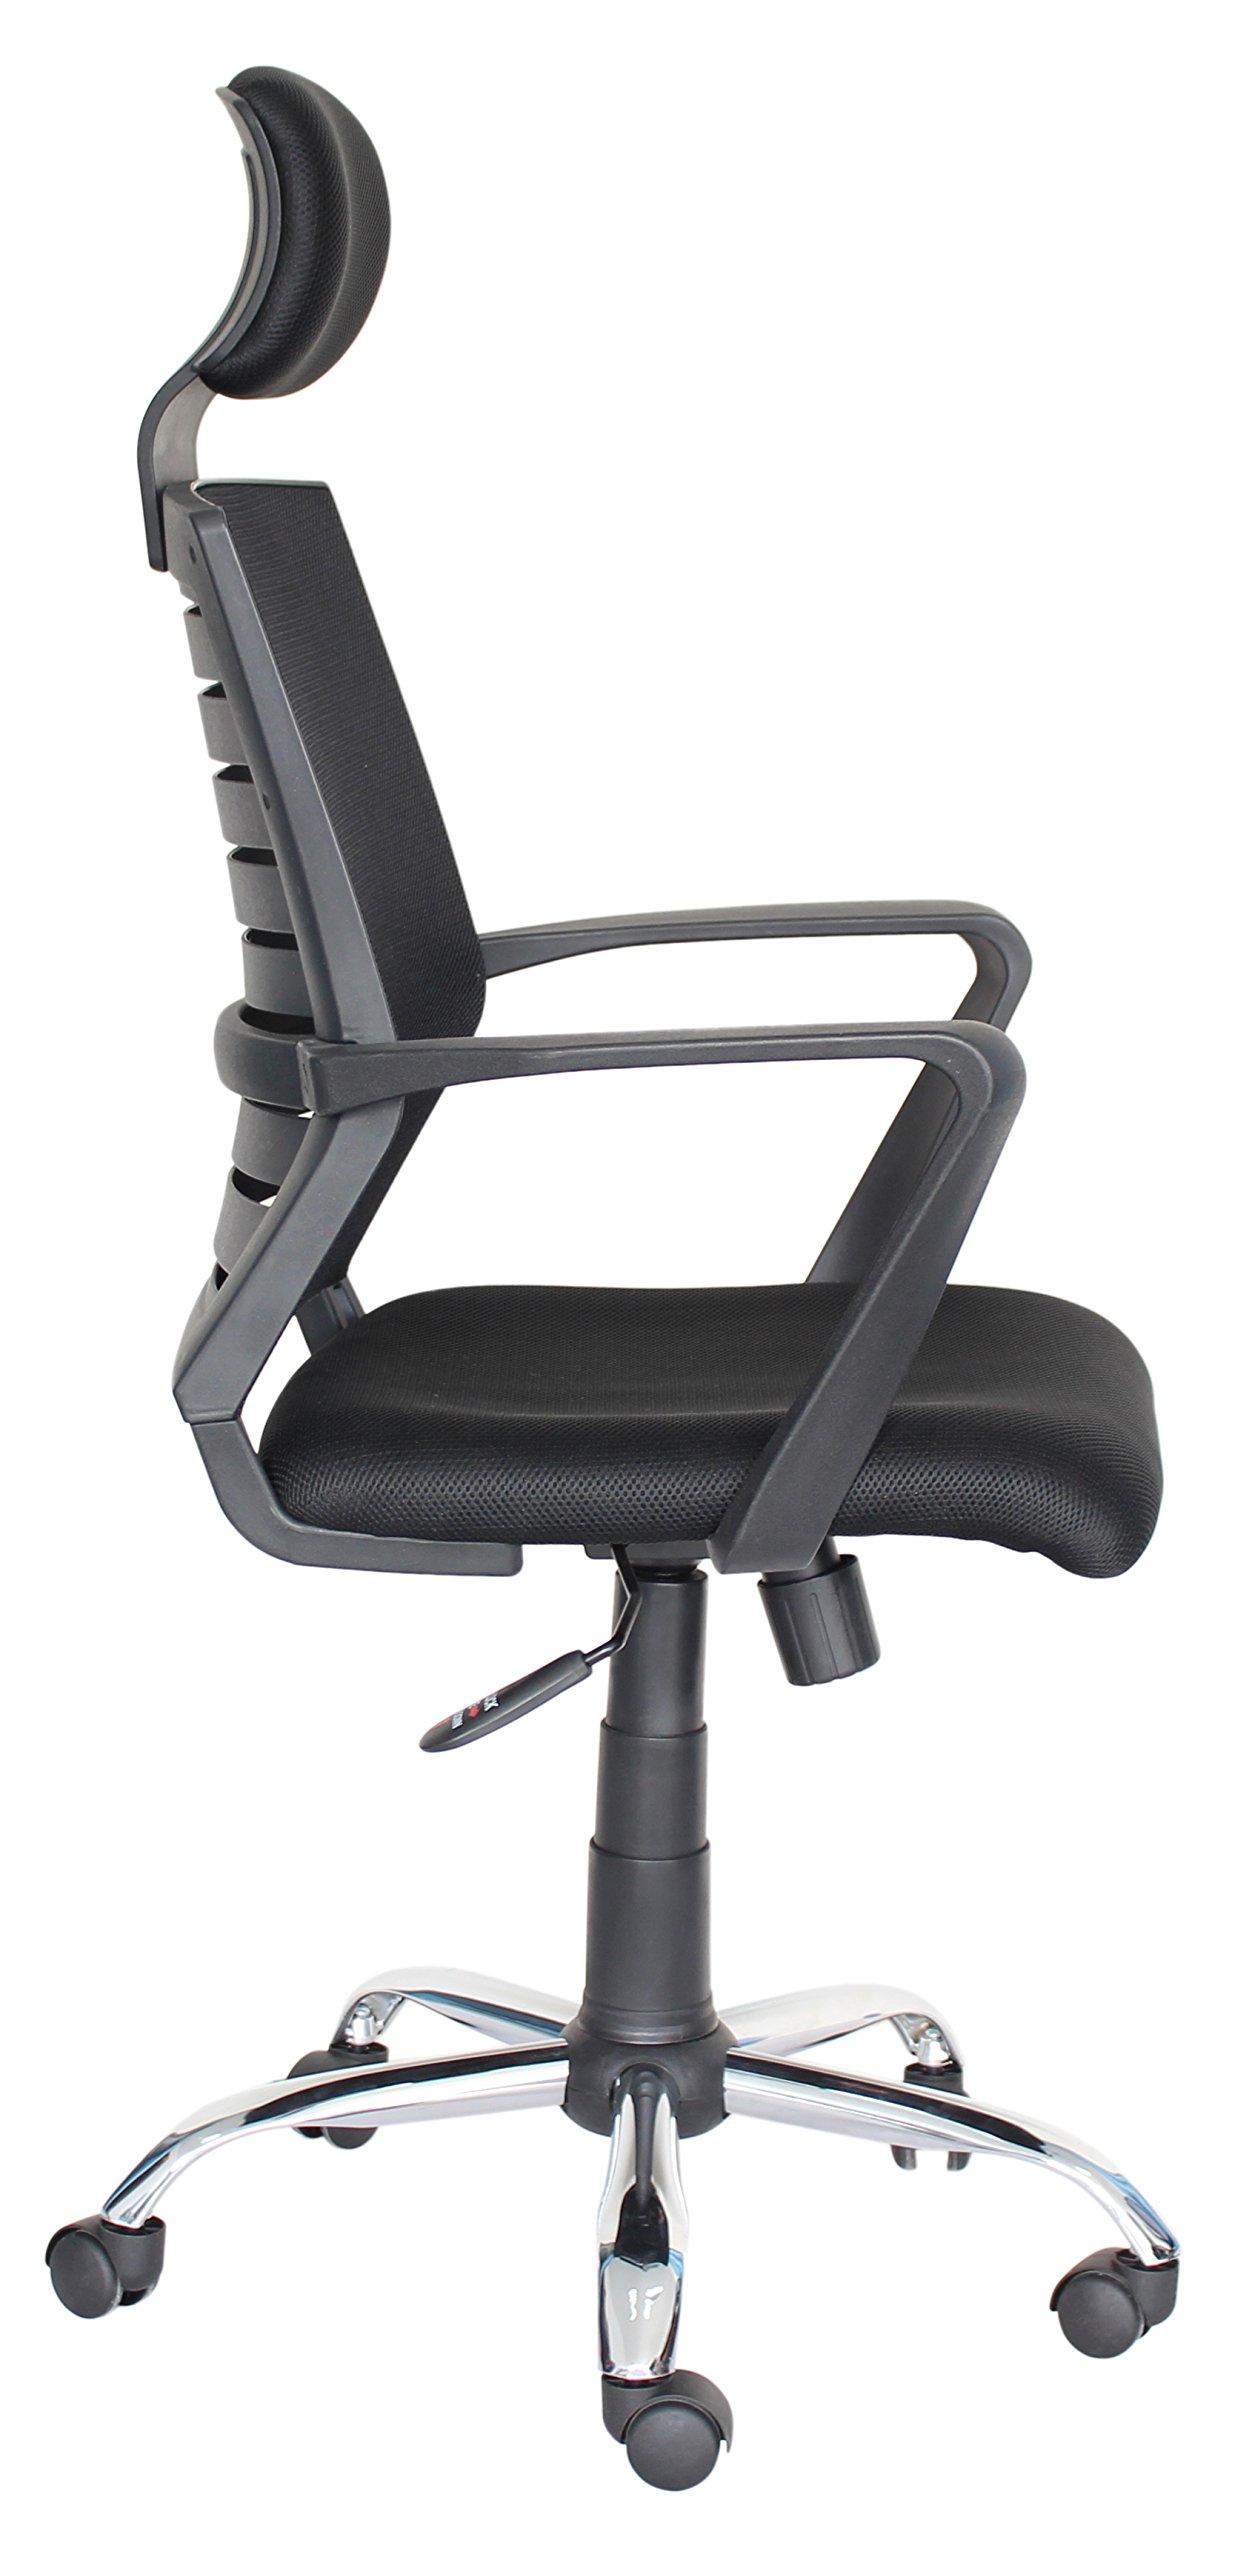 Top Power – Silla de Oficina con Respaldo Alto, diseño ergonómico, Altura Ajustable